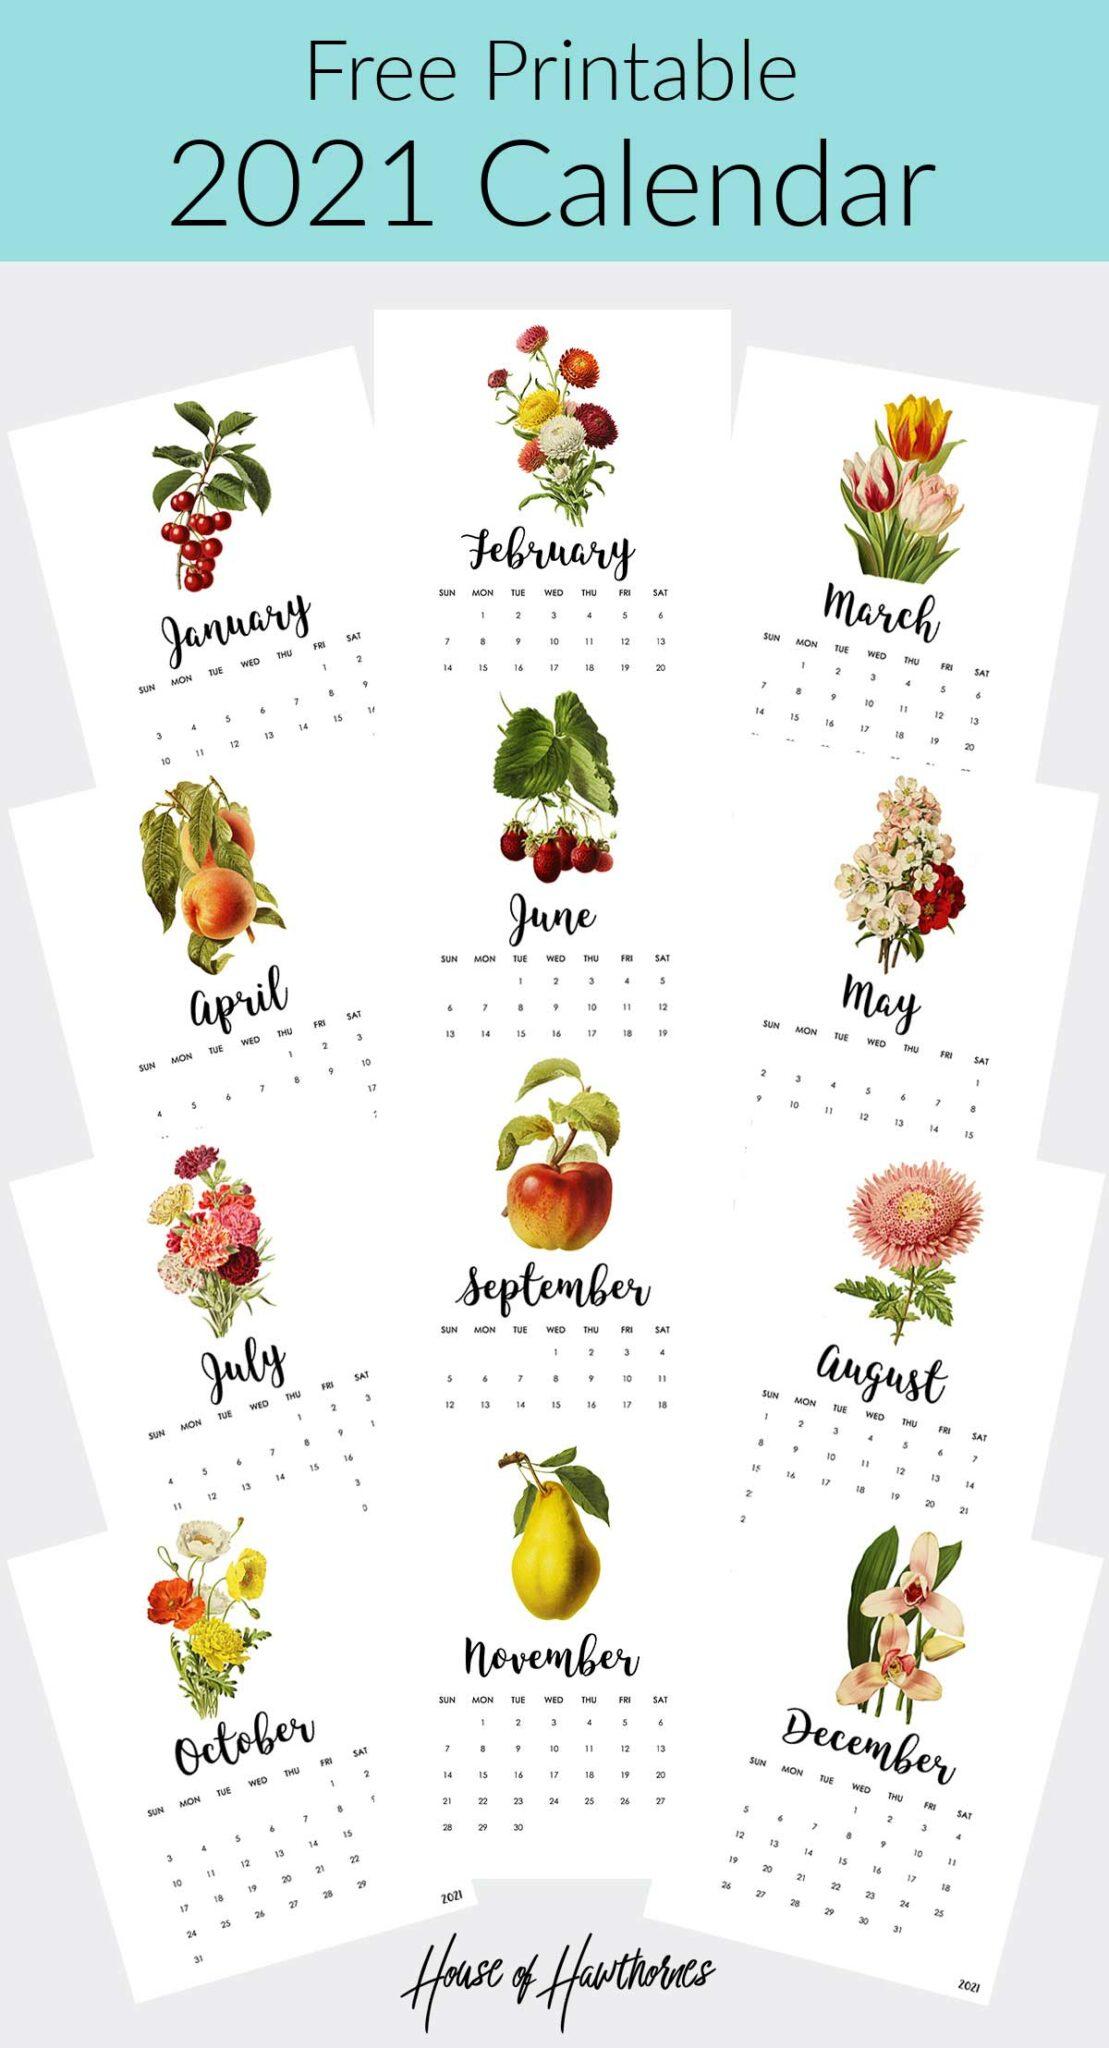 free printable 2021 calendar with vintage botanical illustrations